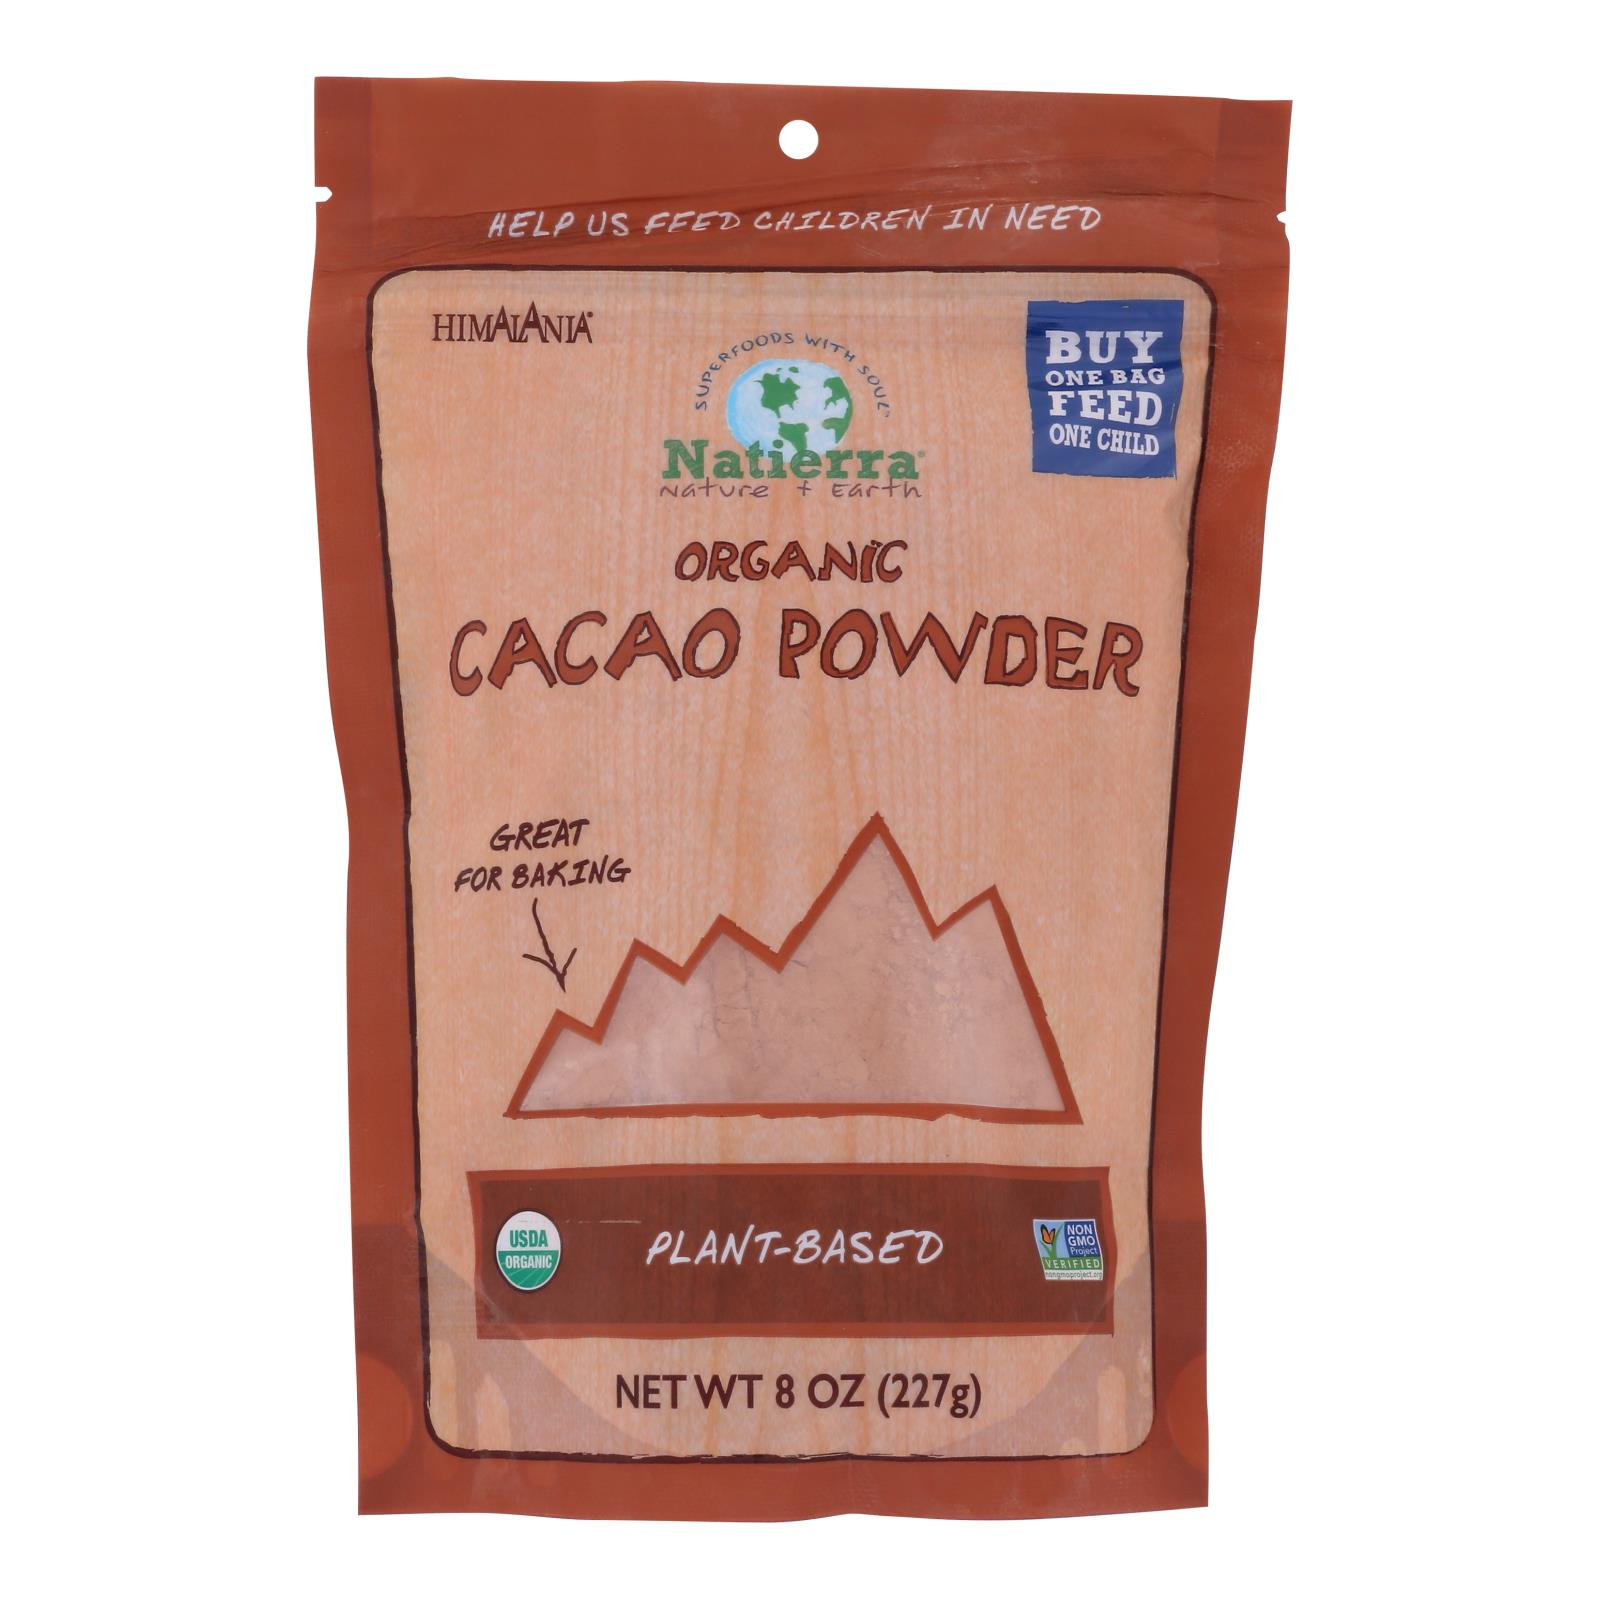 Natierra Organic Cacao Powder - Case of 6 - 8 oz